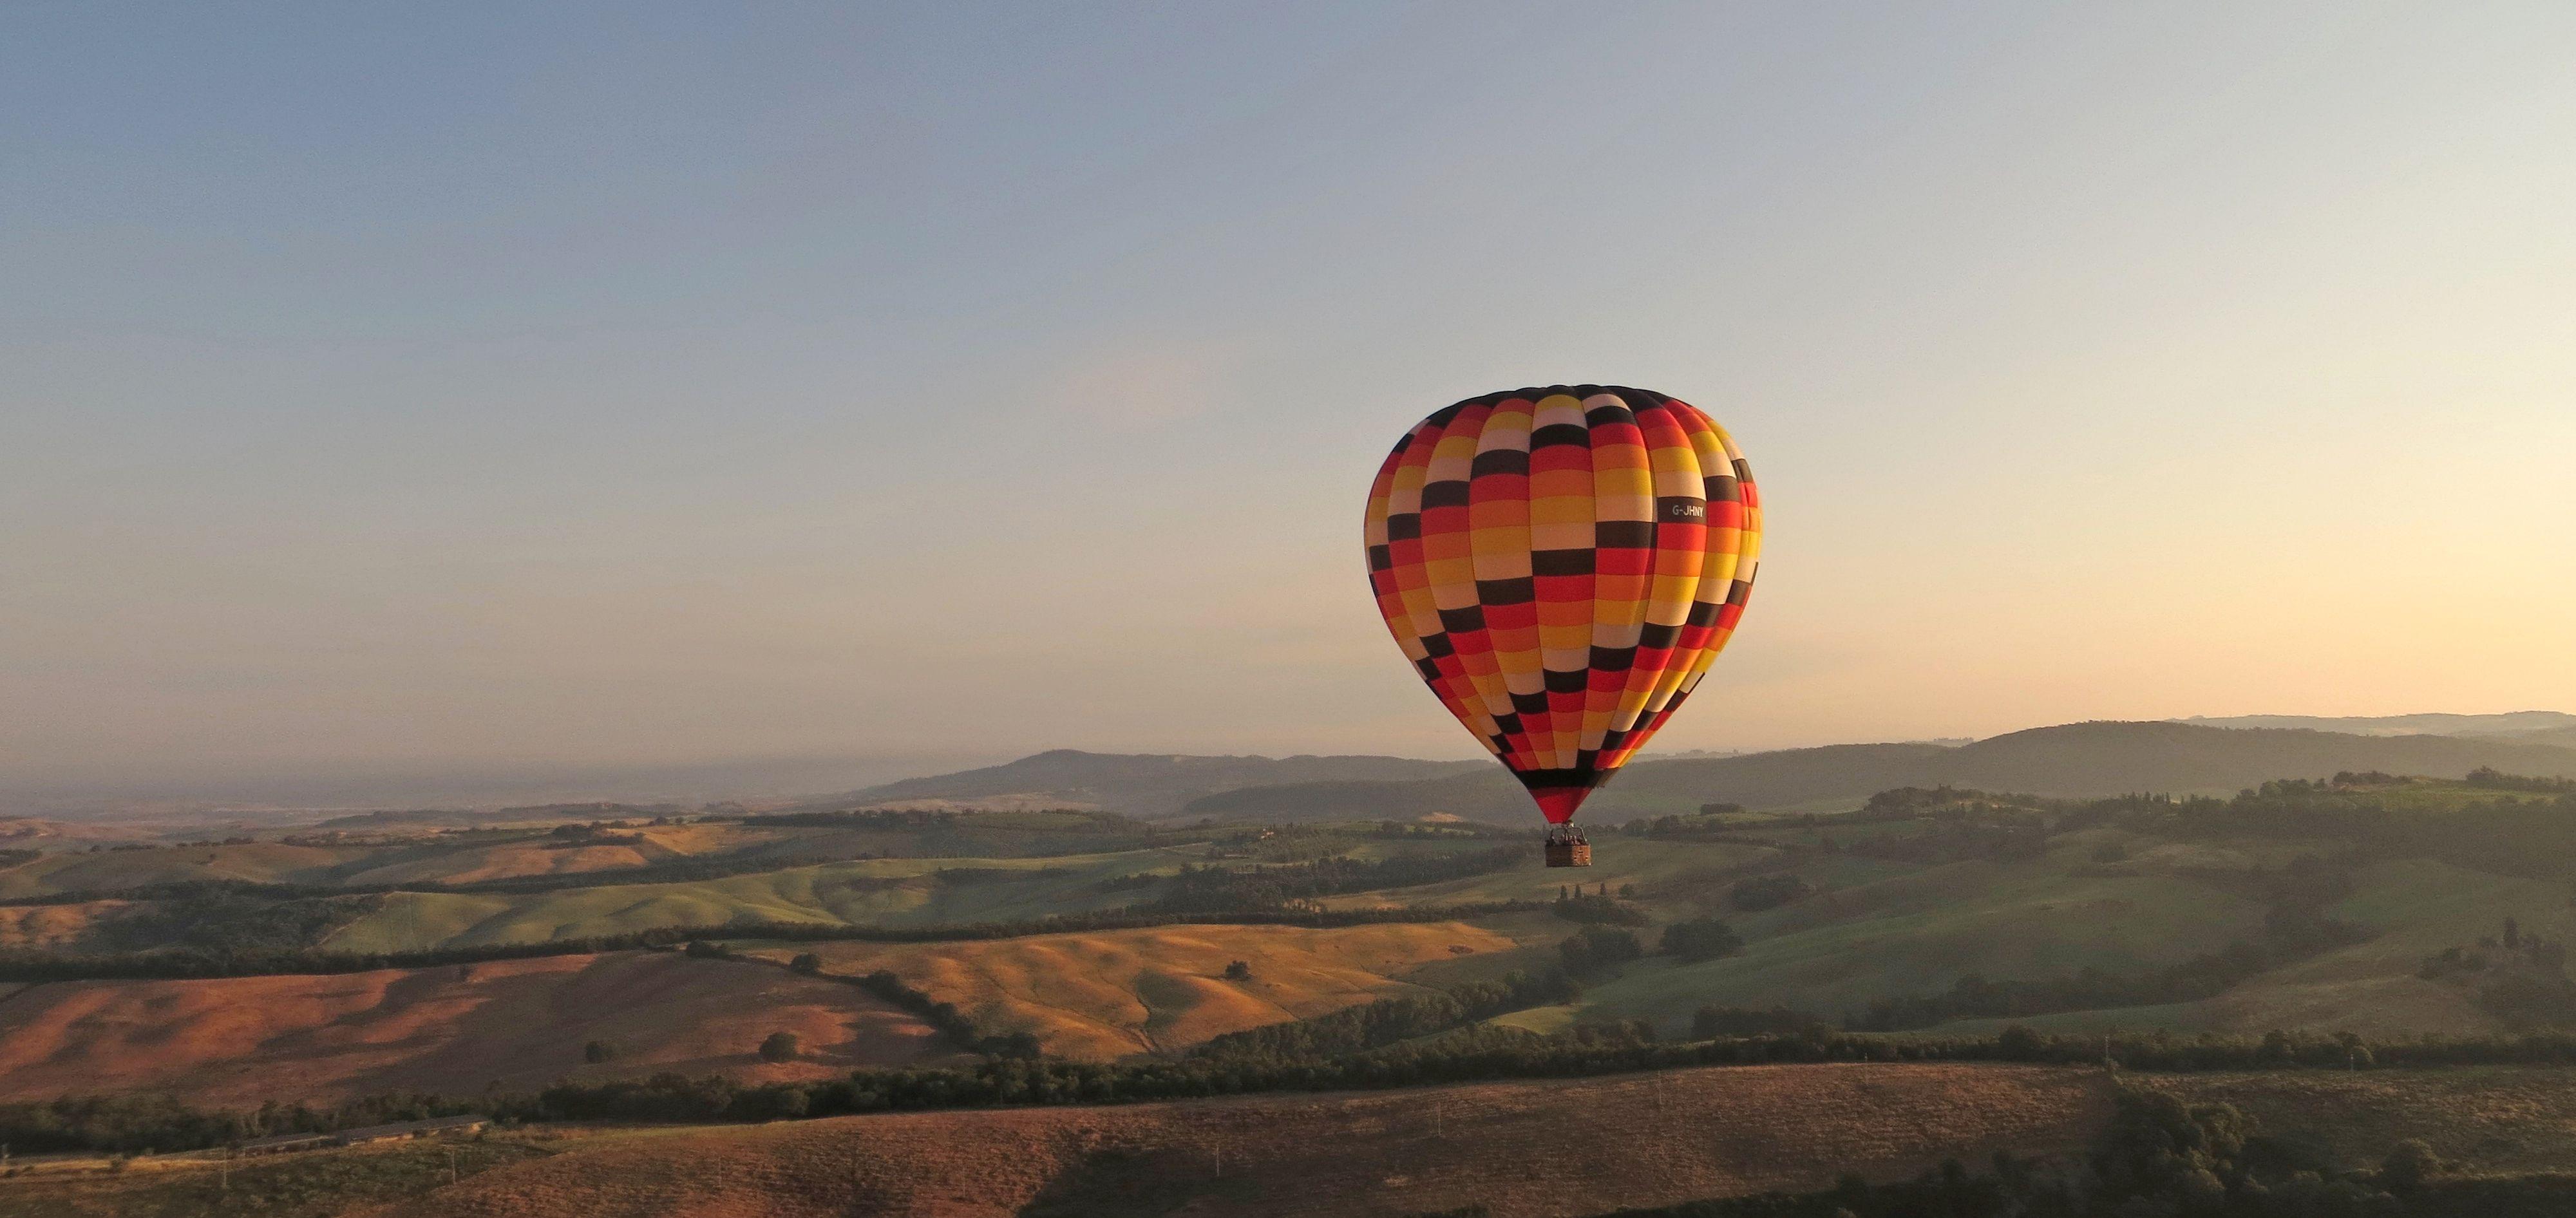 Ballooning In Tuscany to Ballooning in Tuscany